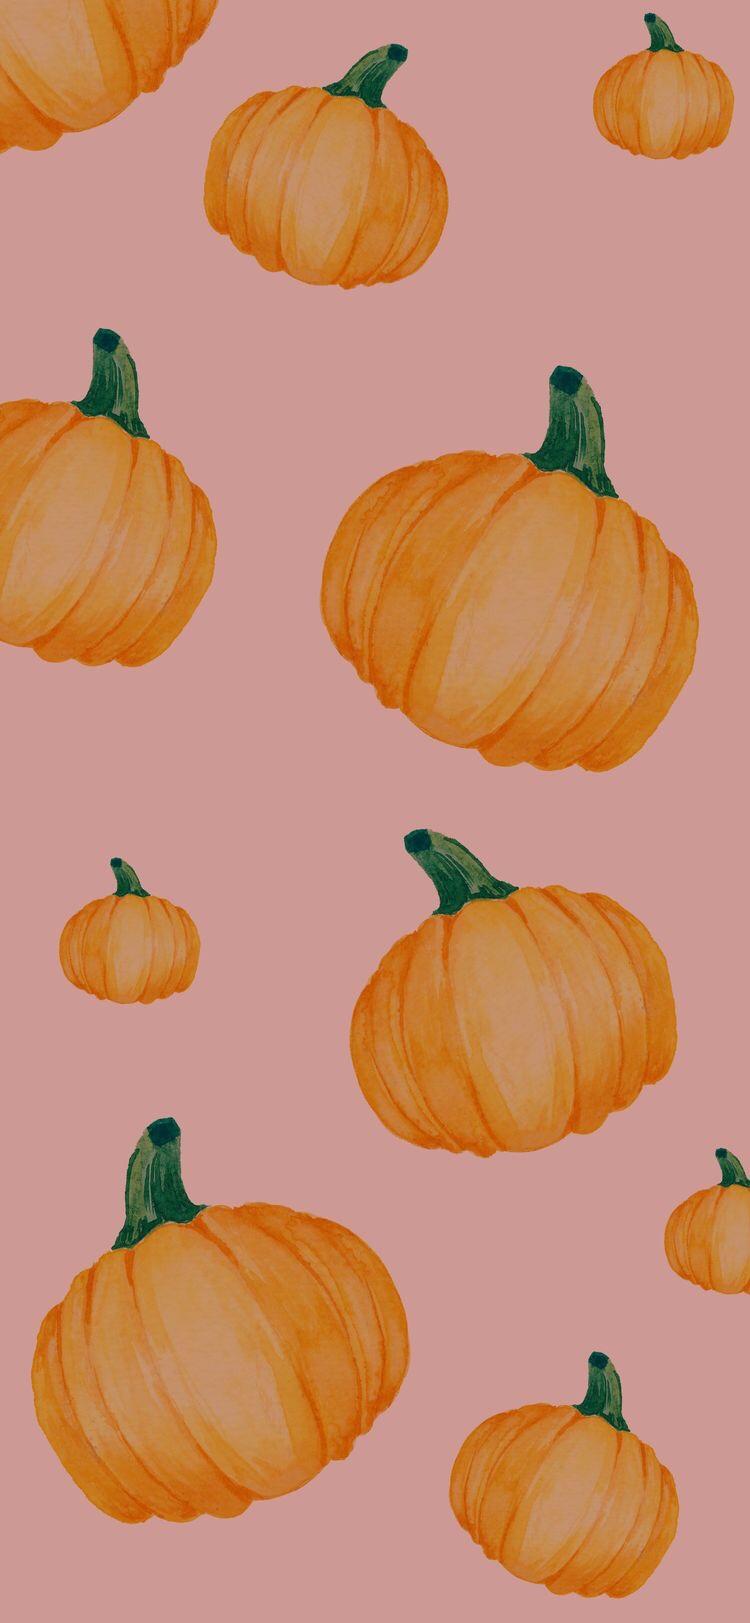 Cute Fall Aesthetic Wallpapers Pumpkins Pin On Pumpkin Perfected